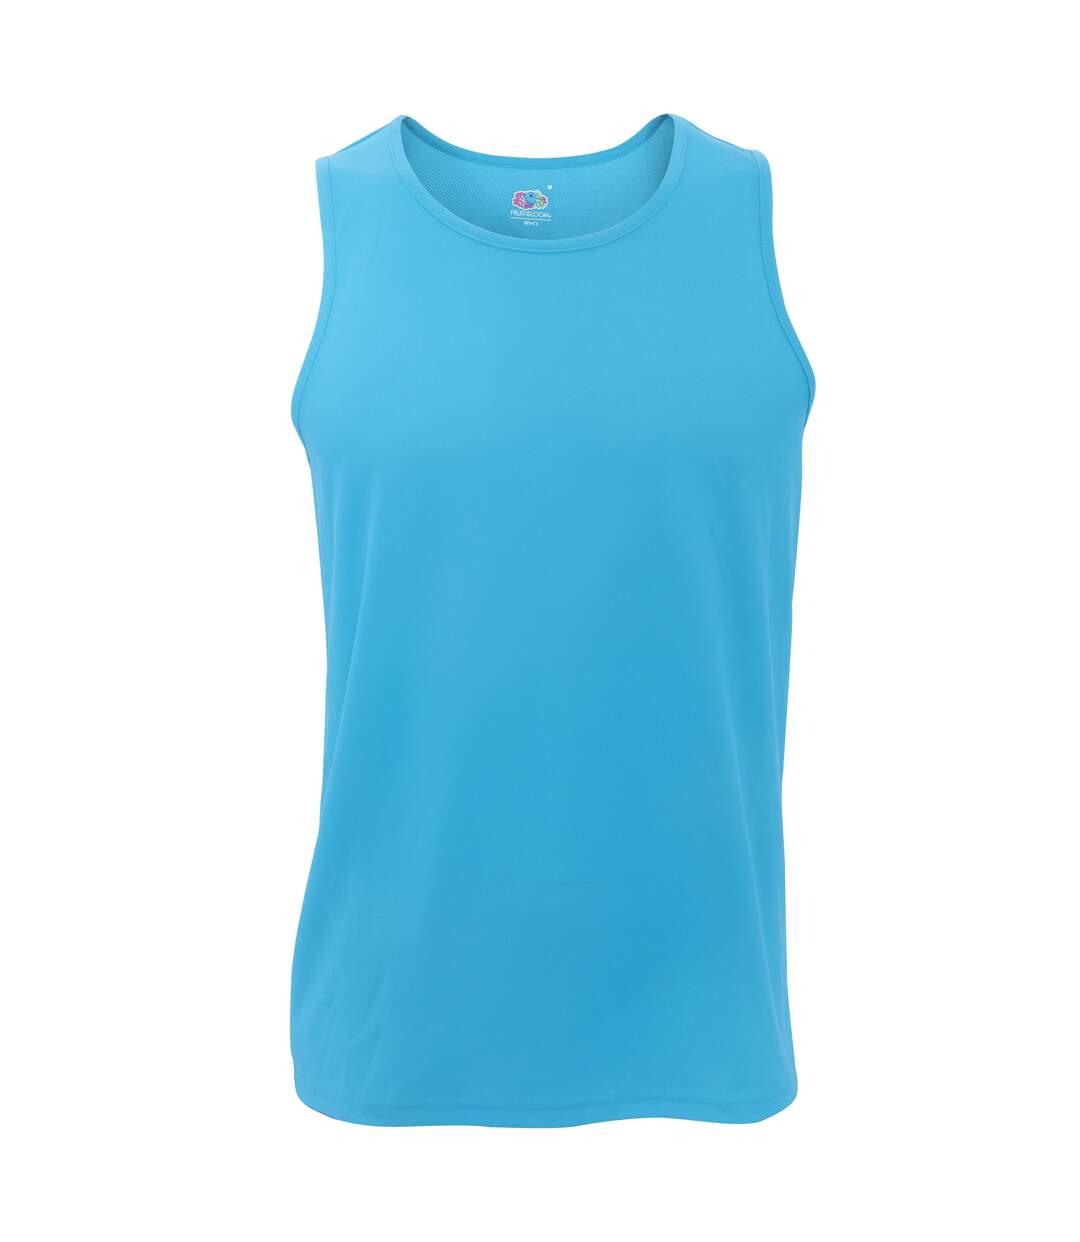 Fruit Of The Loom Mens Moisture Wicking Performance Vest Top (Azure Blue) - UTRW4705